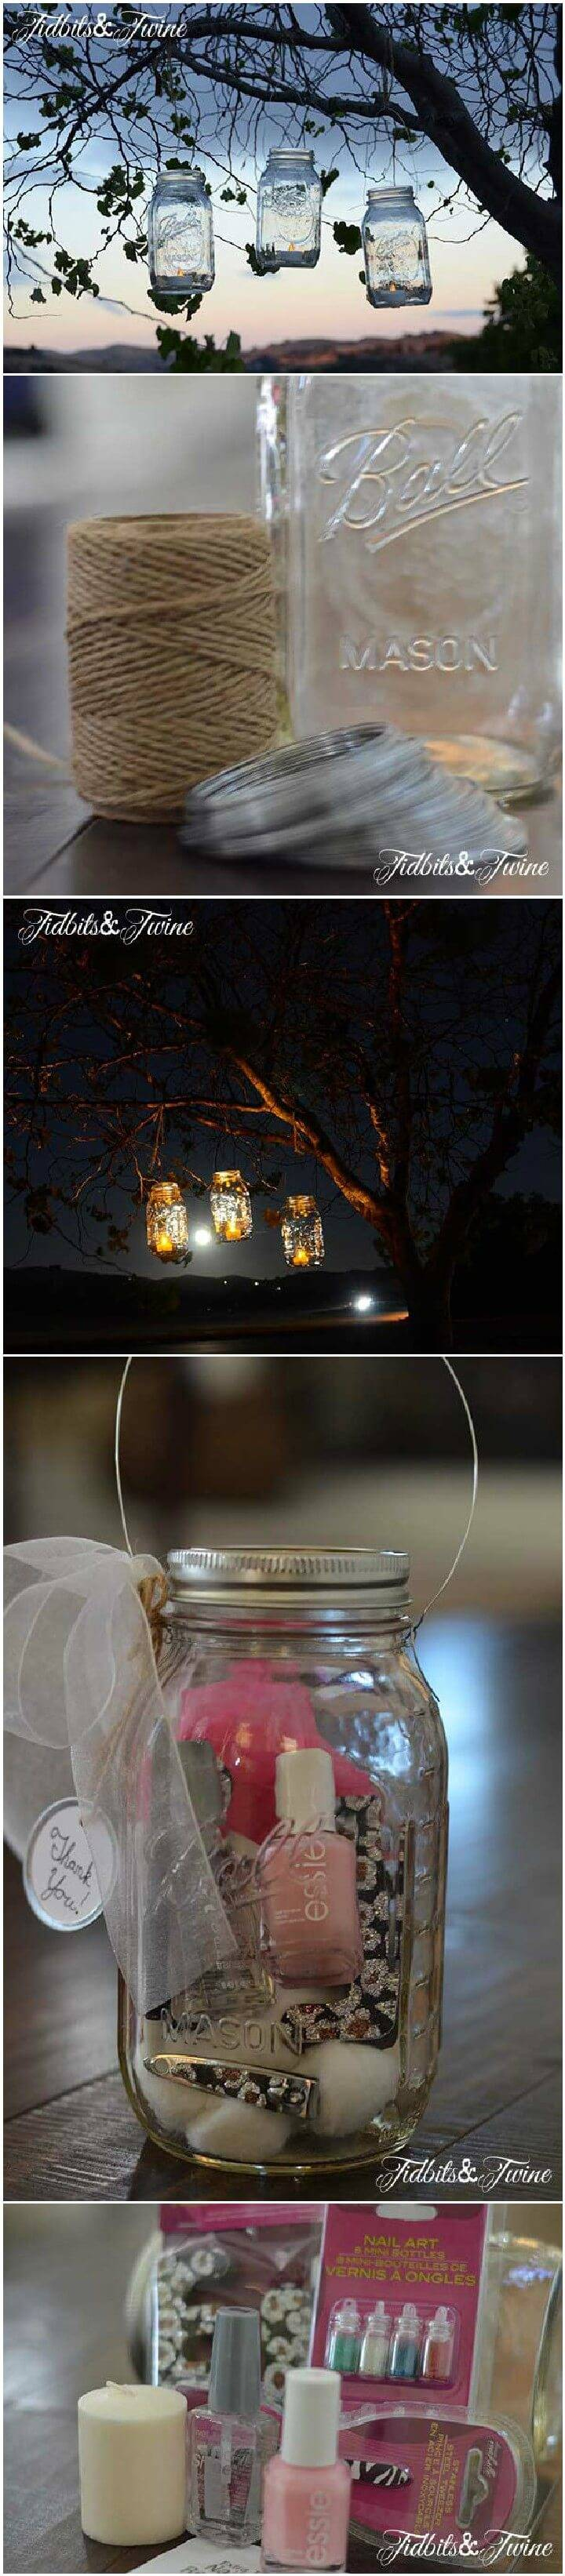 DIY Mason Jar Manicure Set Lantern Gift